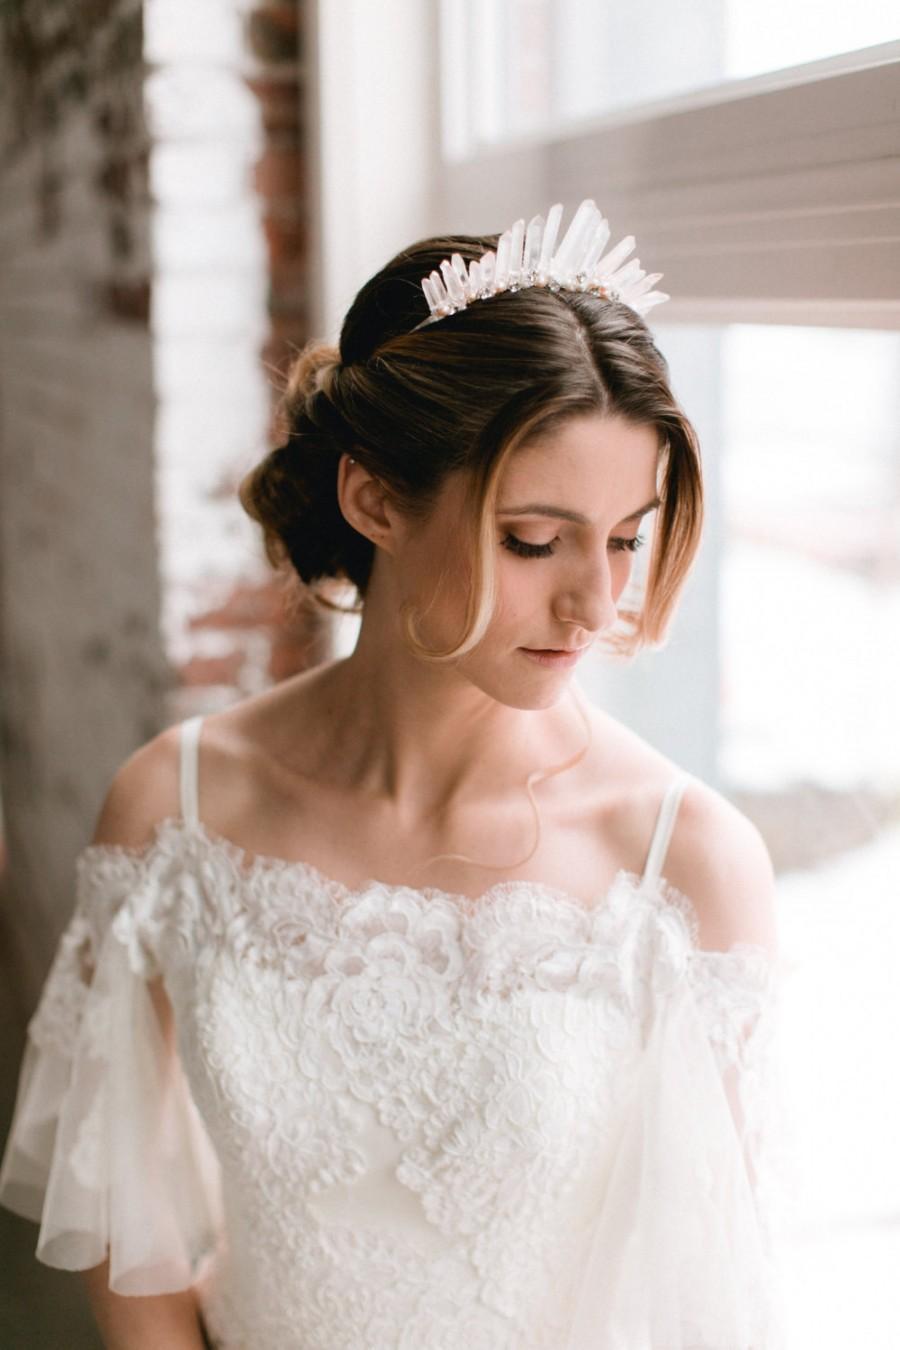 زفاف - SOPHIA - glamorous rose quartz ombre bridal tiara, glam bohemian raw crystal wedding crown, boho modern bride headpiece